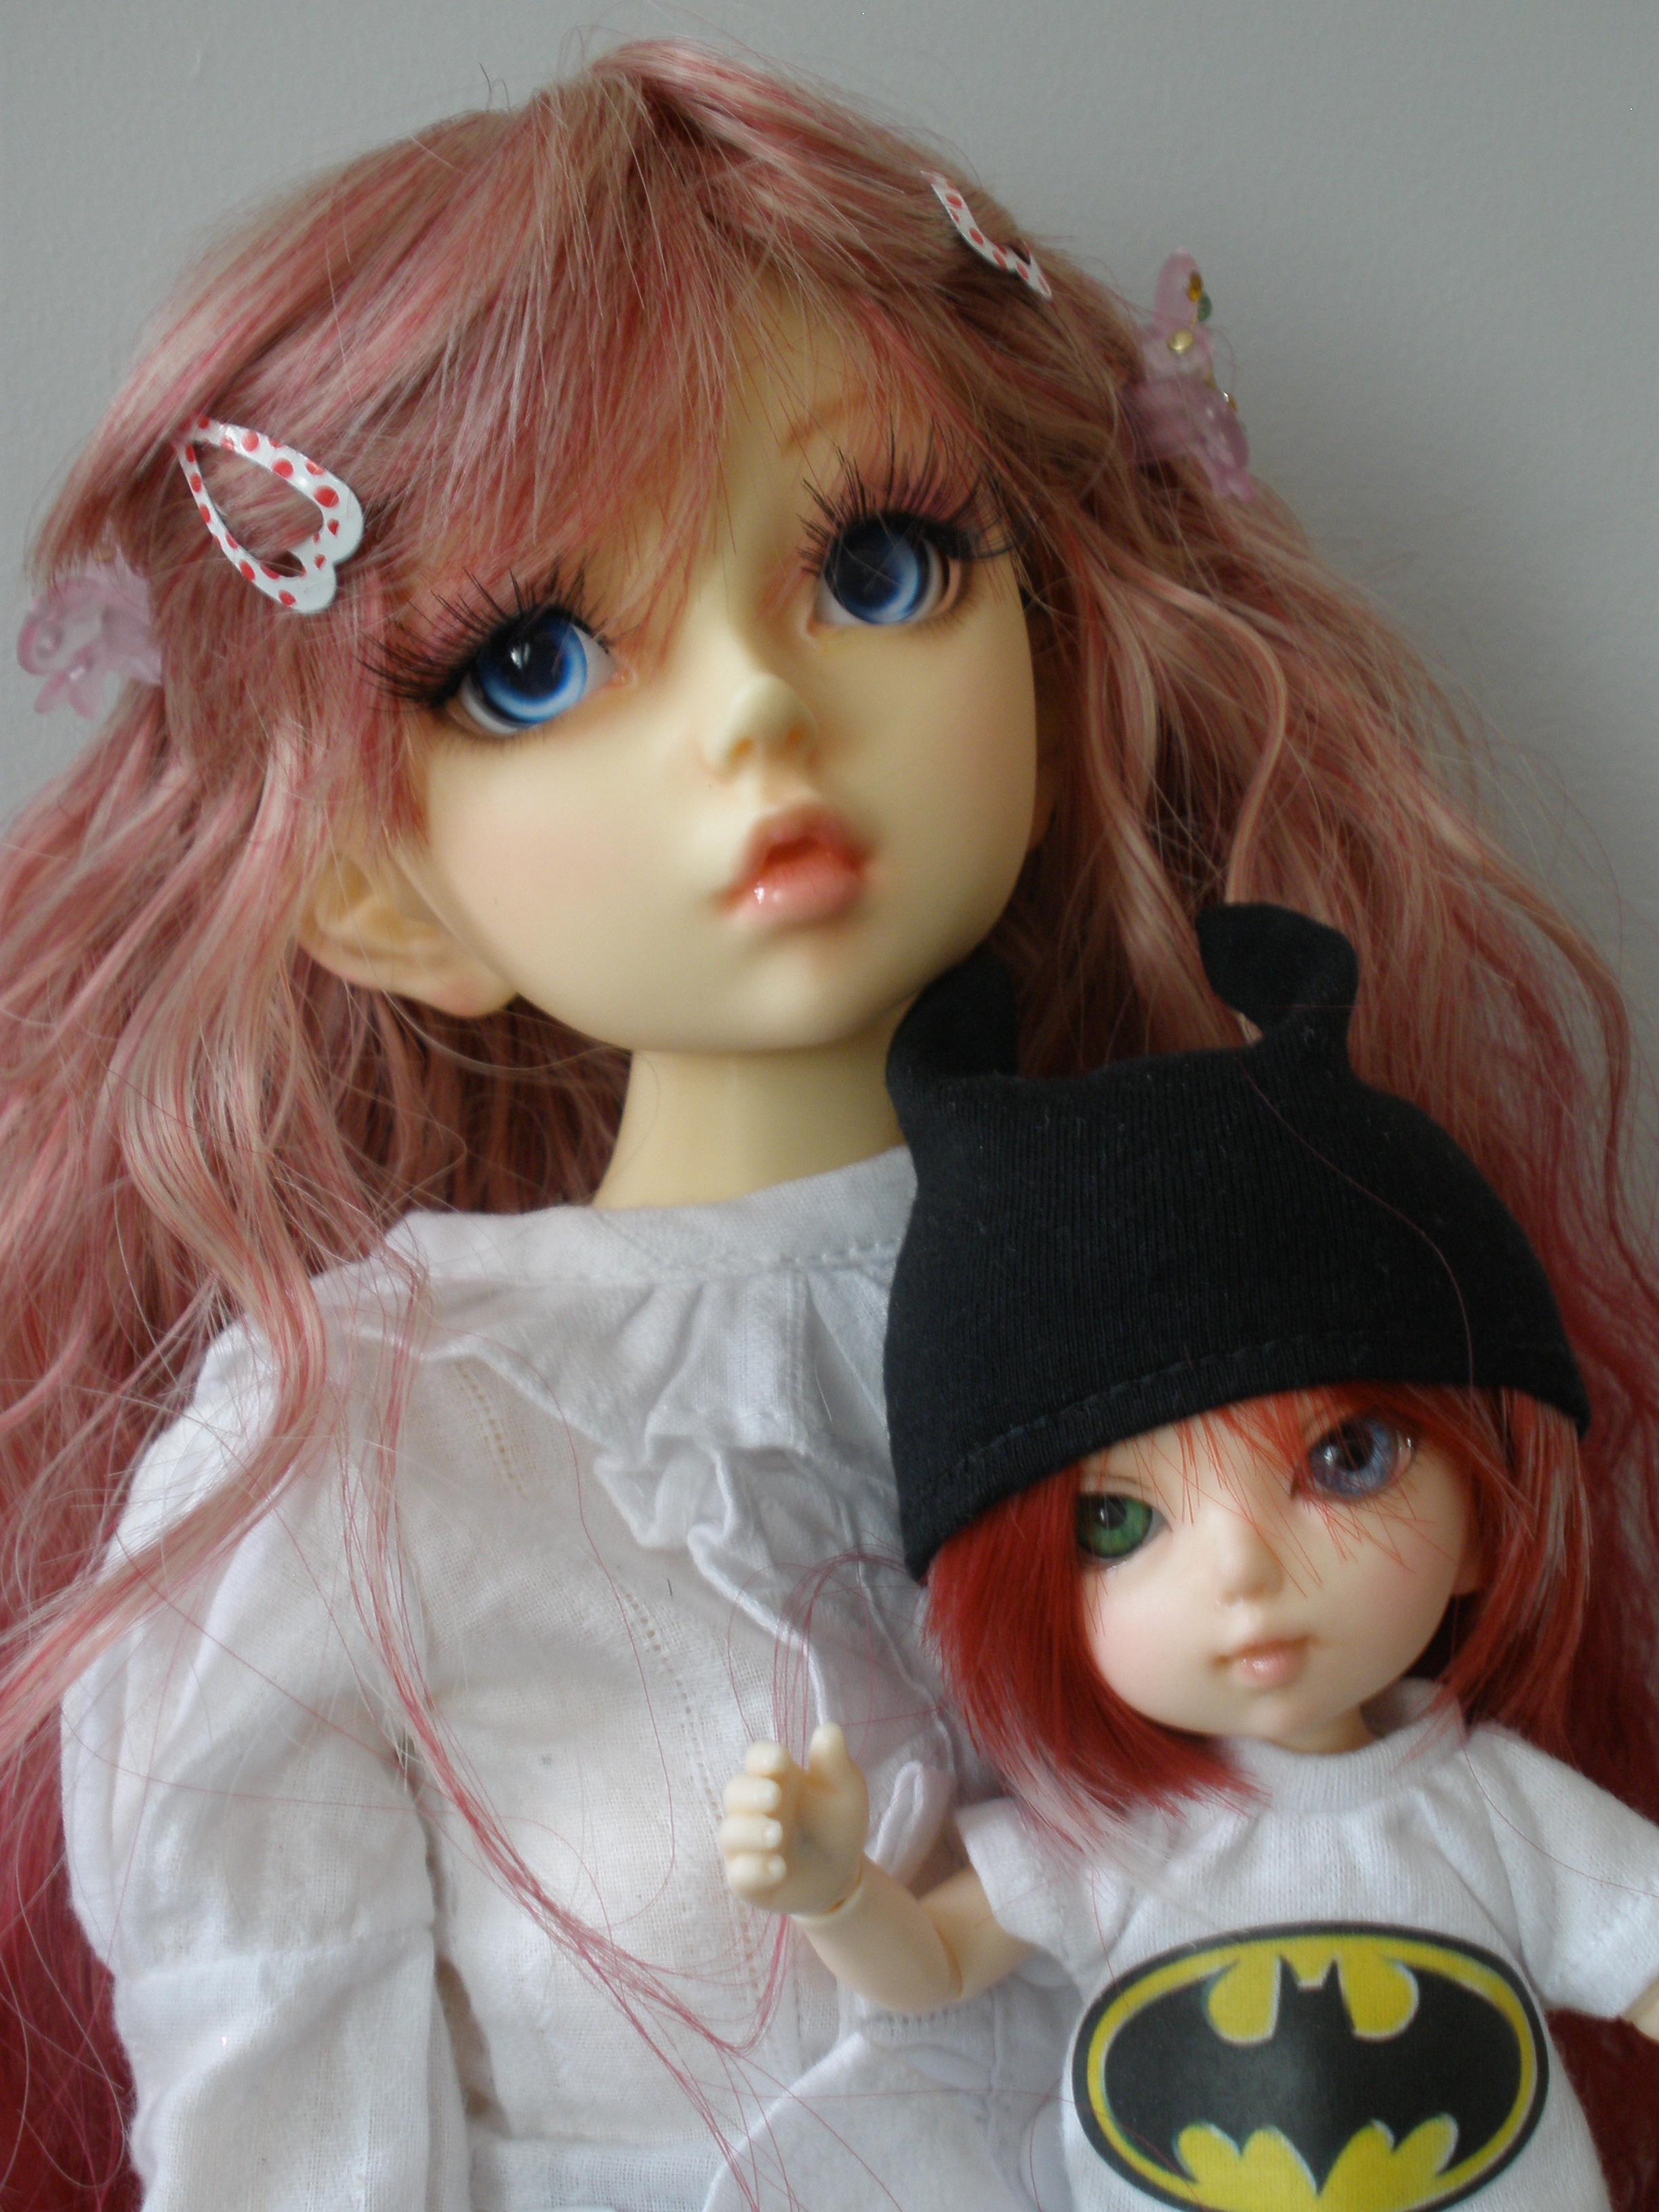 My Lorina and my Pukifee Shiwoo by AcexKeikai